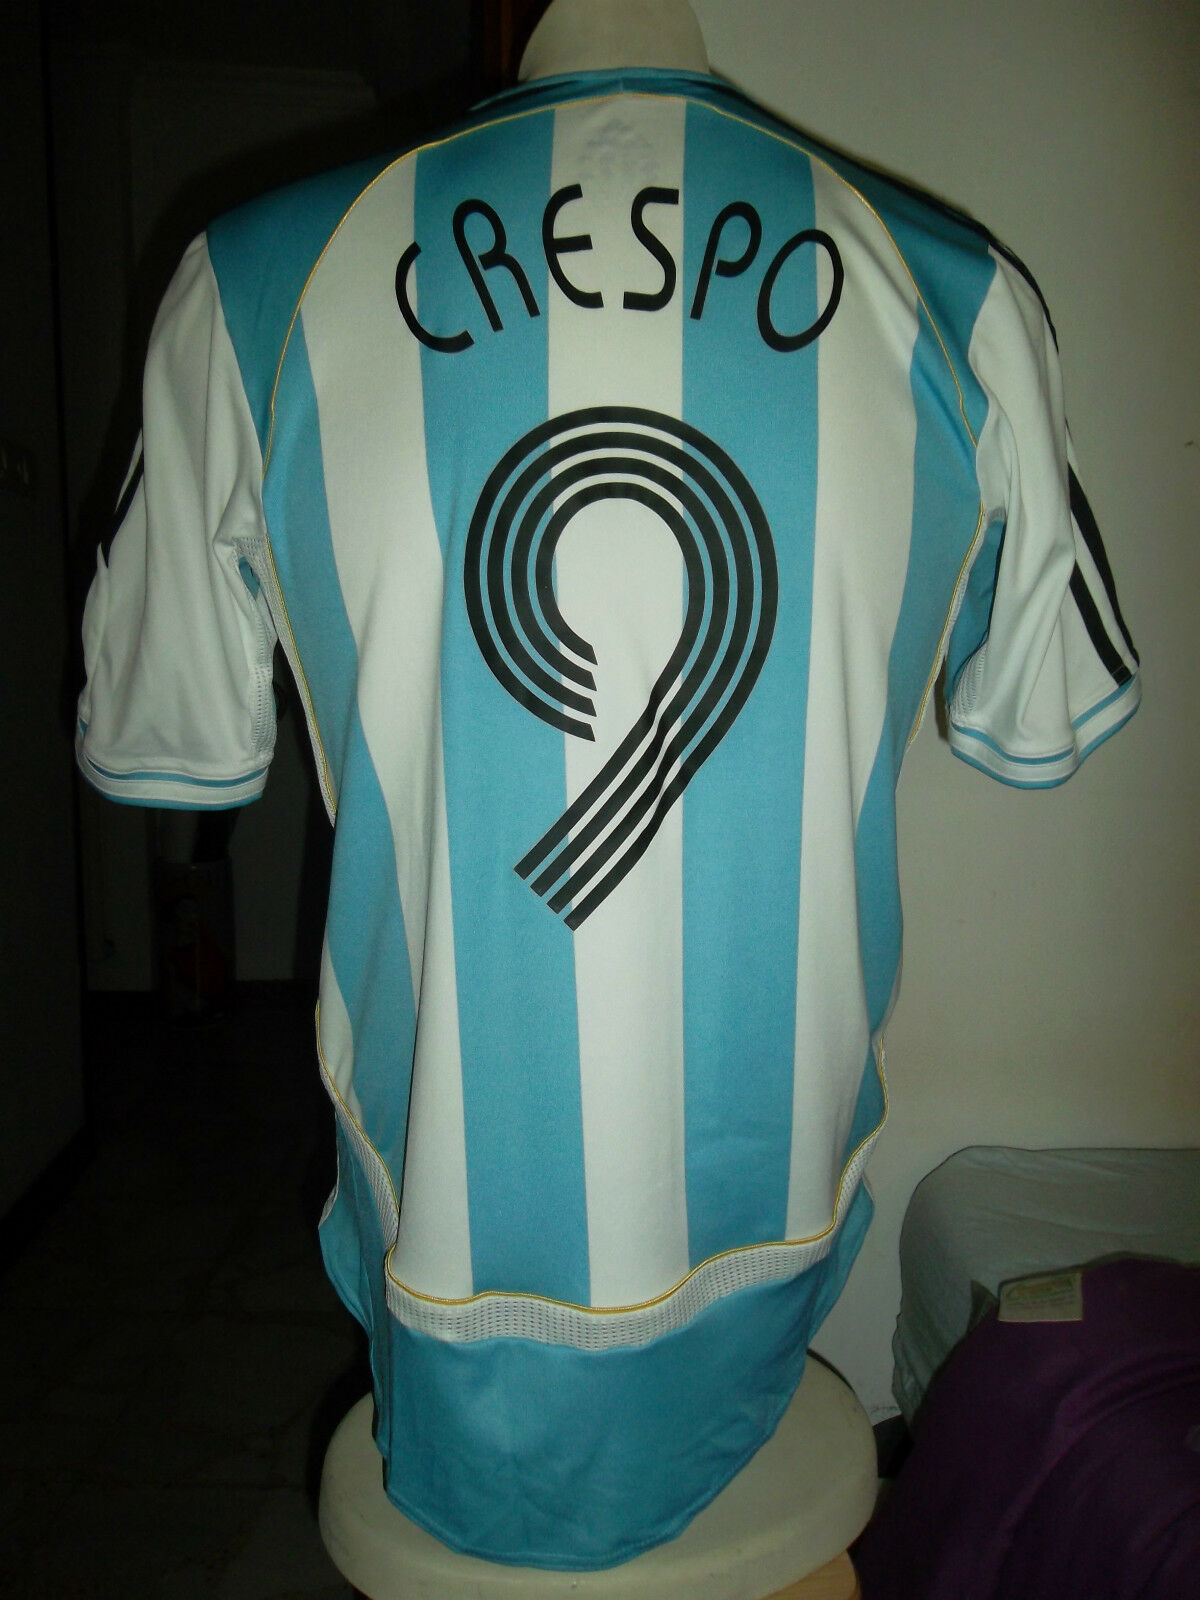 Jersey Camiseta Trikot vtg Crespo t-shirt adidas M Malliot plataina Original